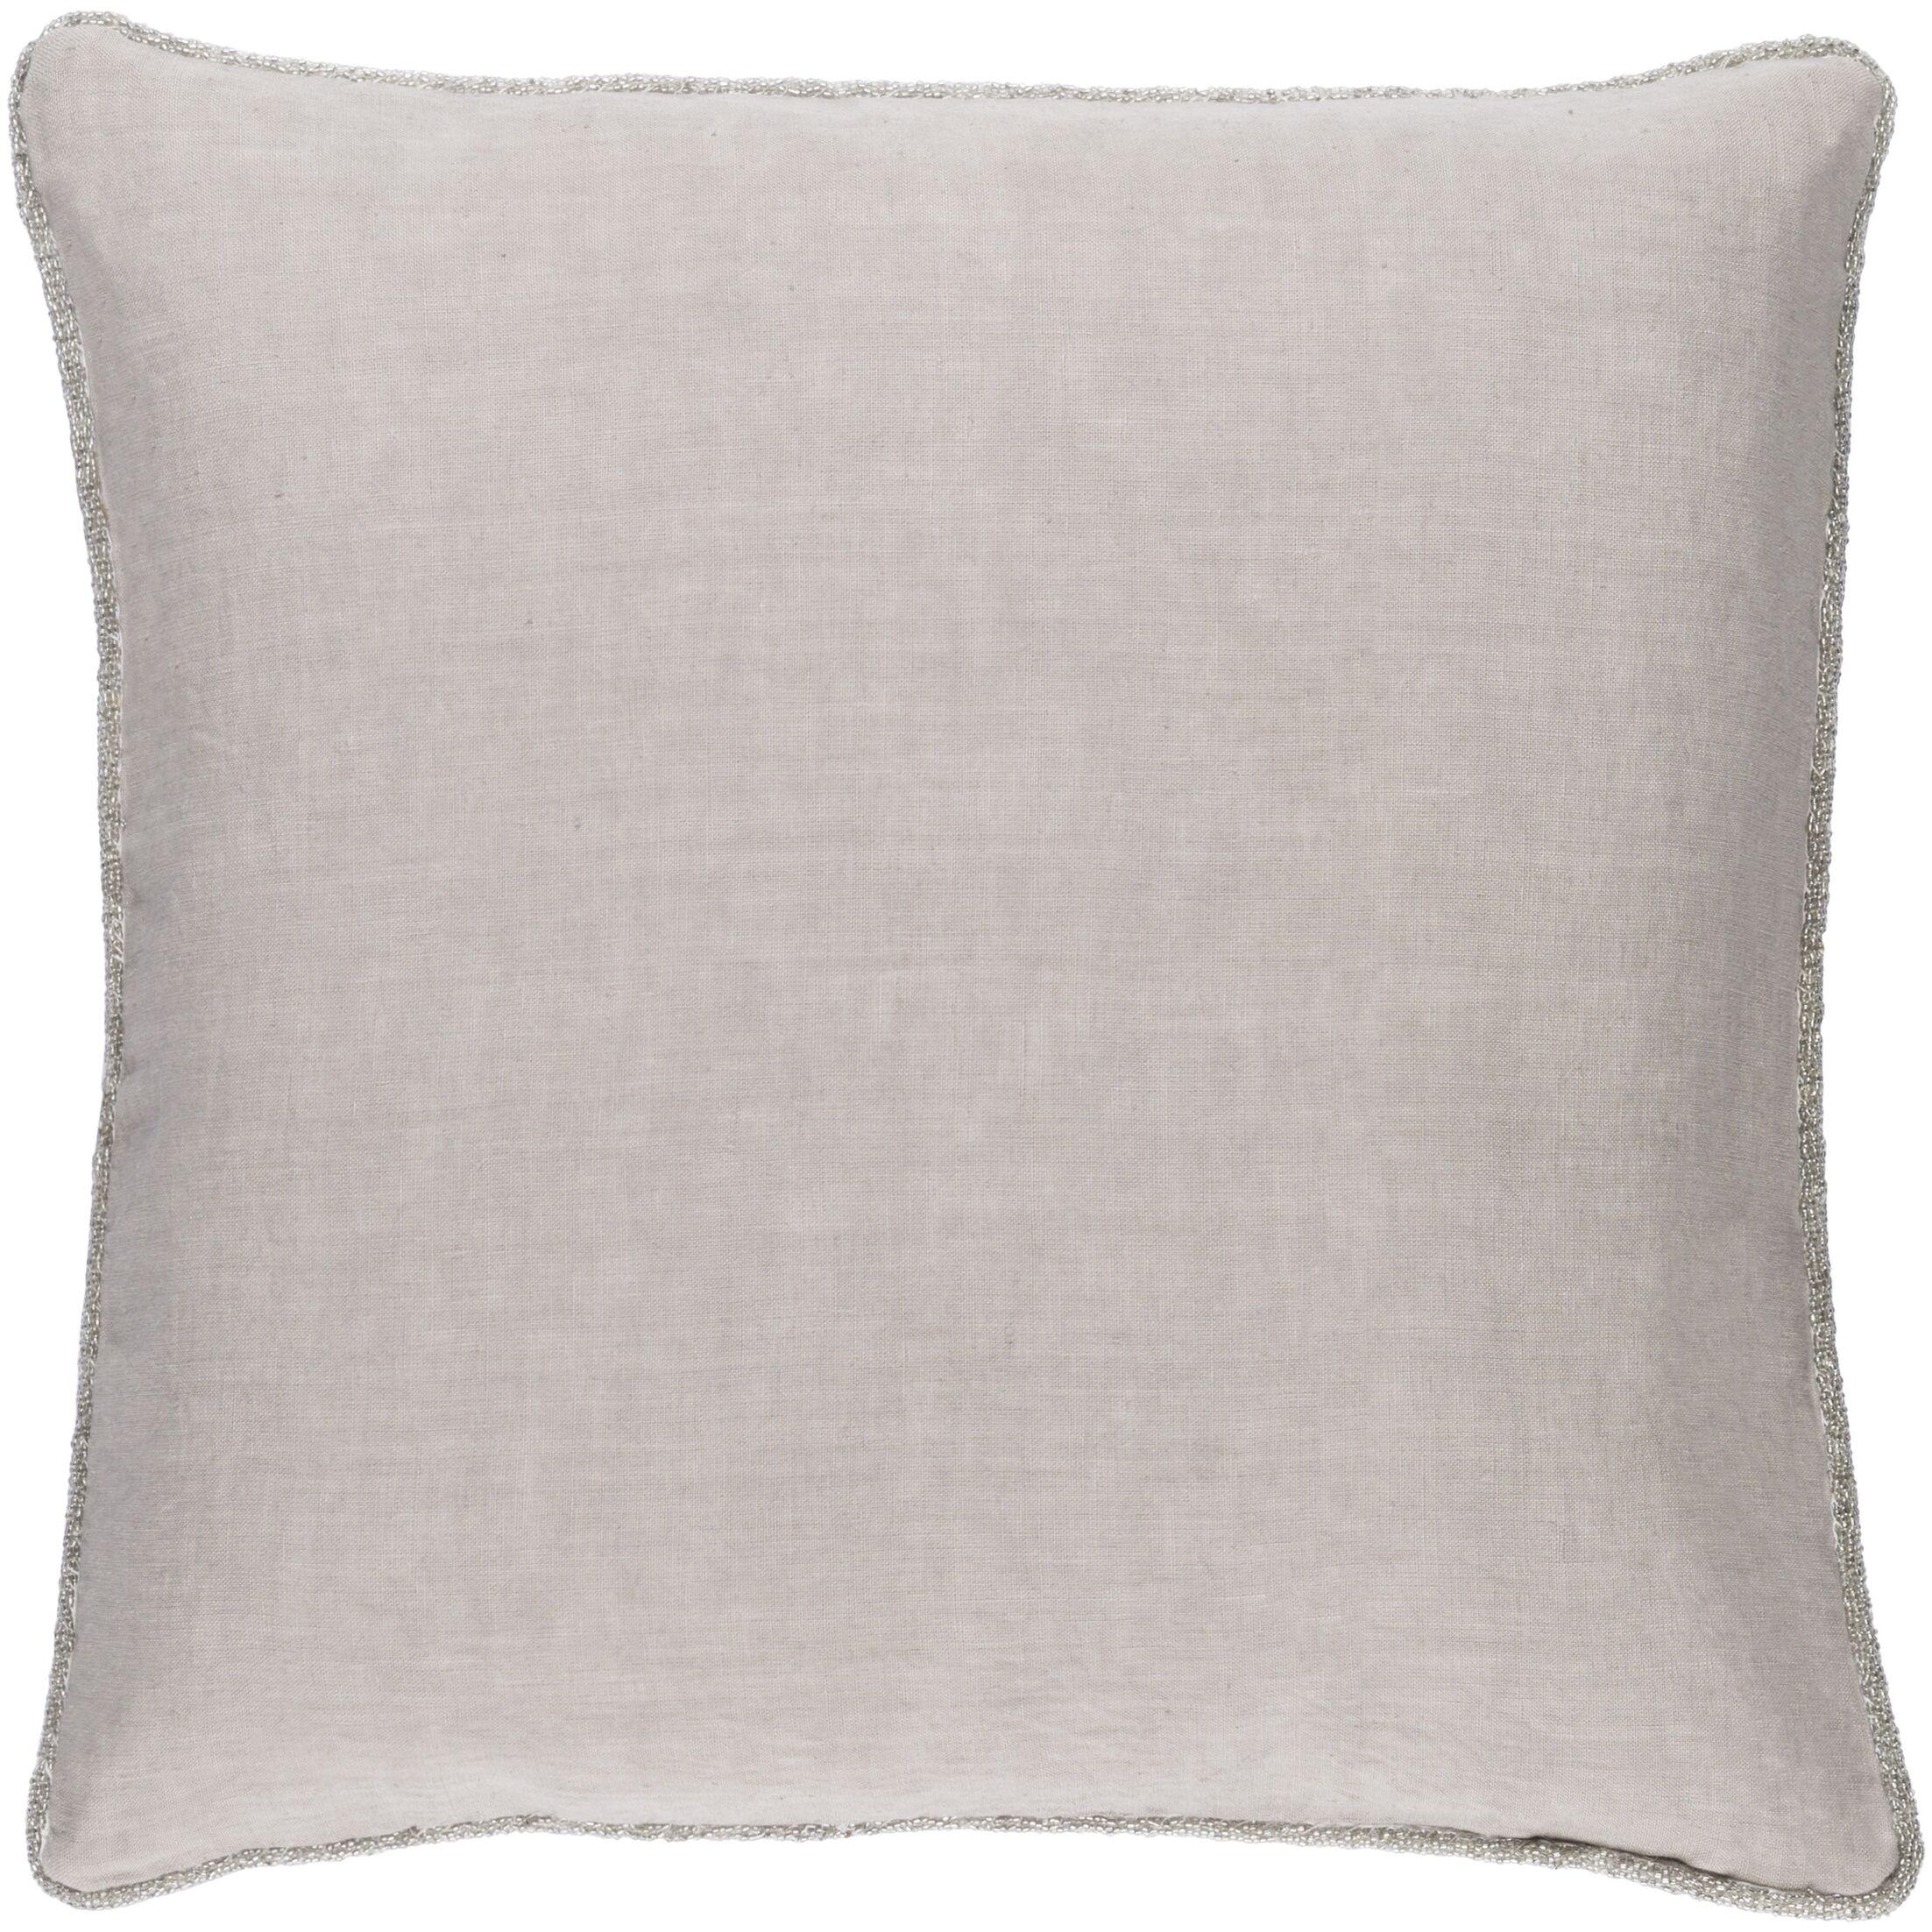 Sera 100% Linen Throw Pillow Cover Size: 22